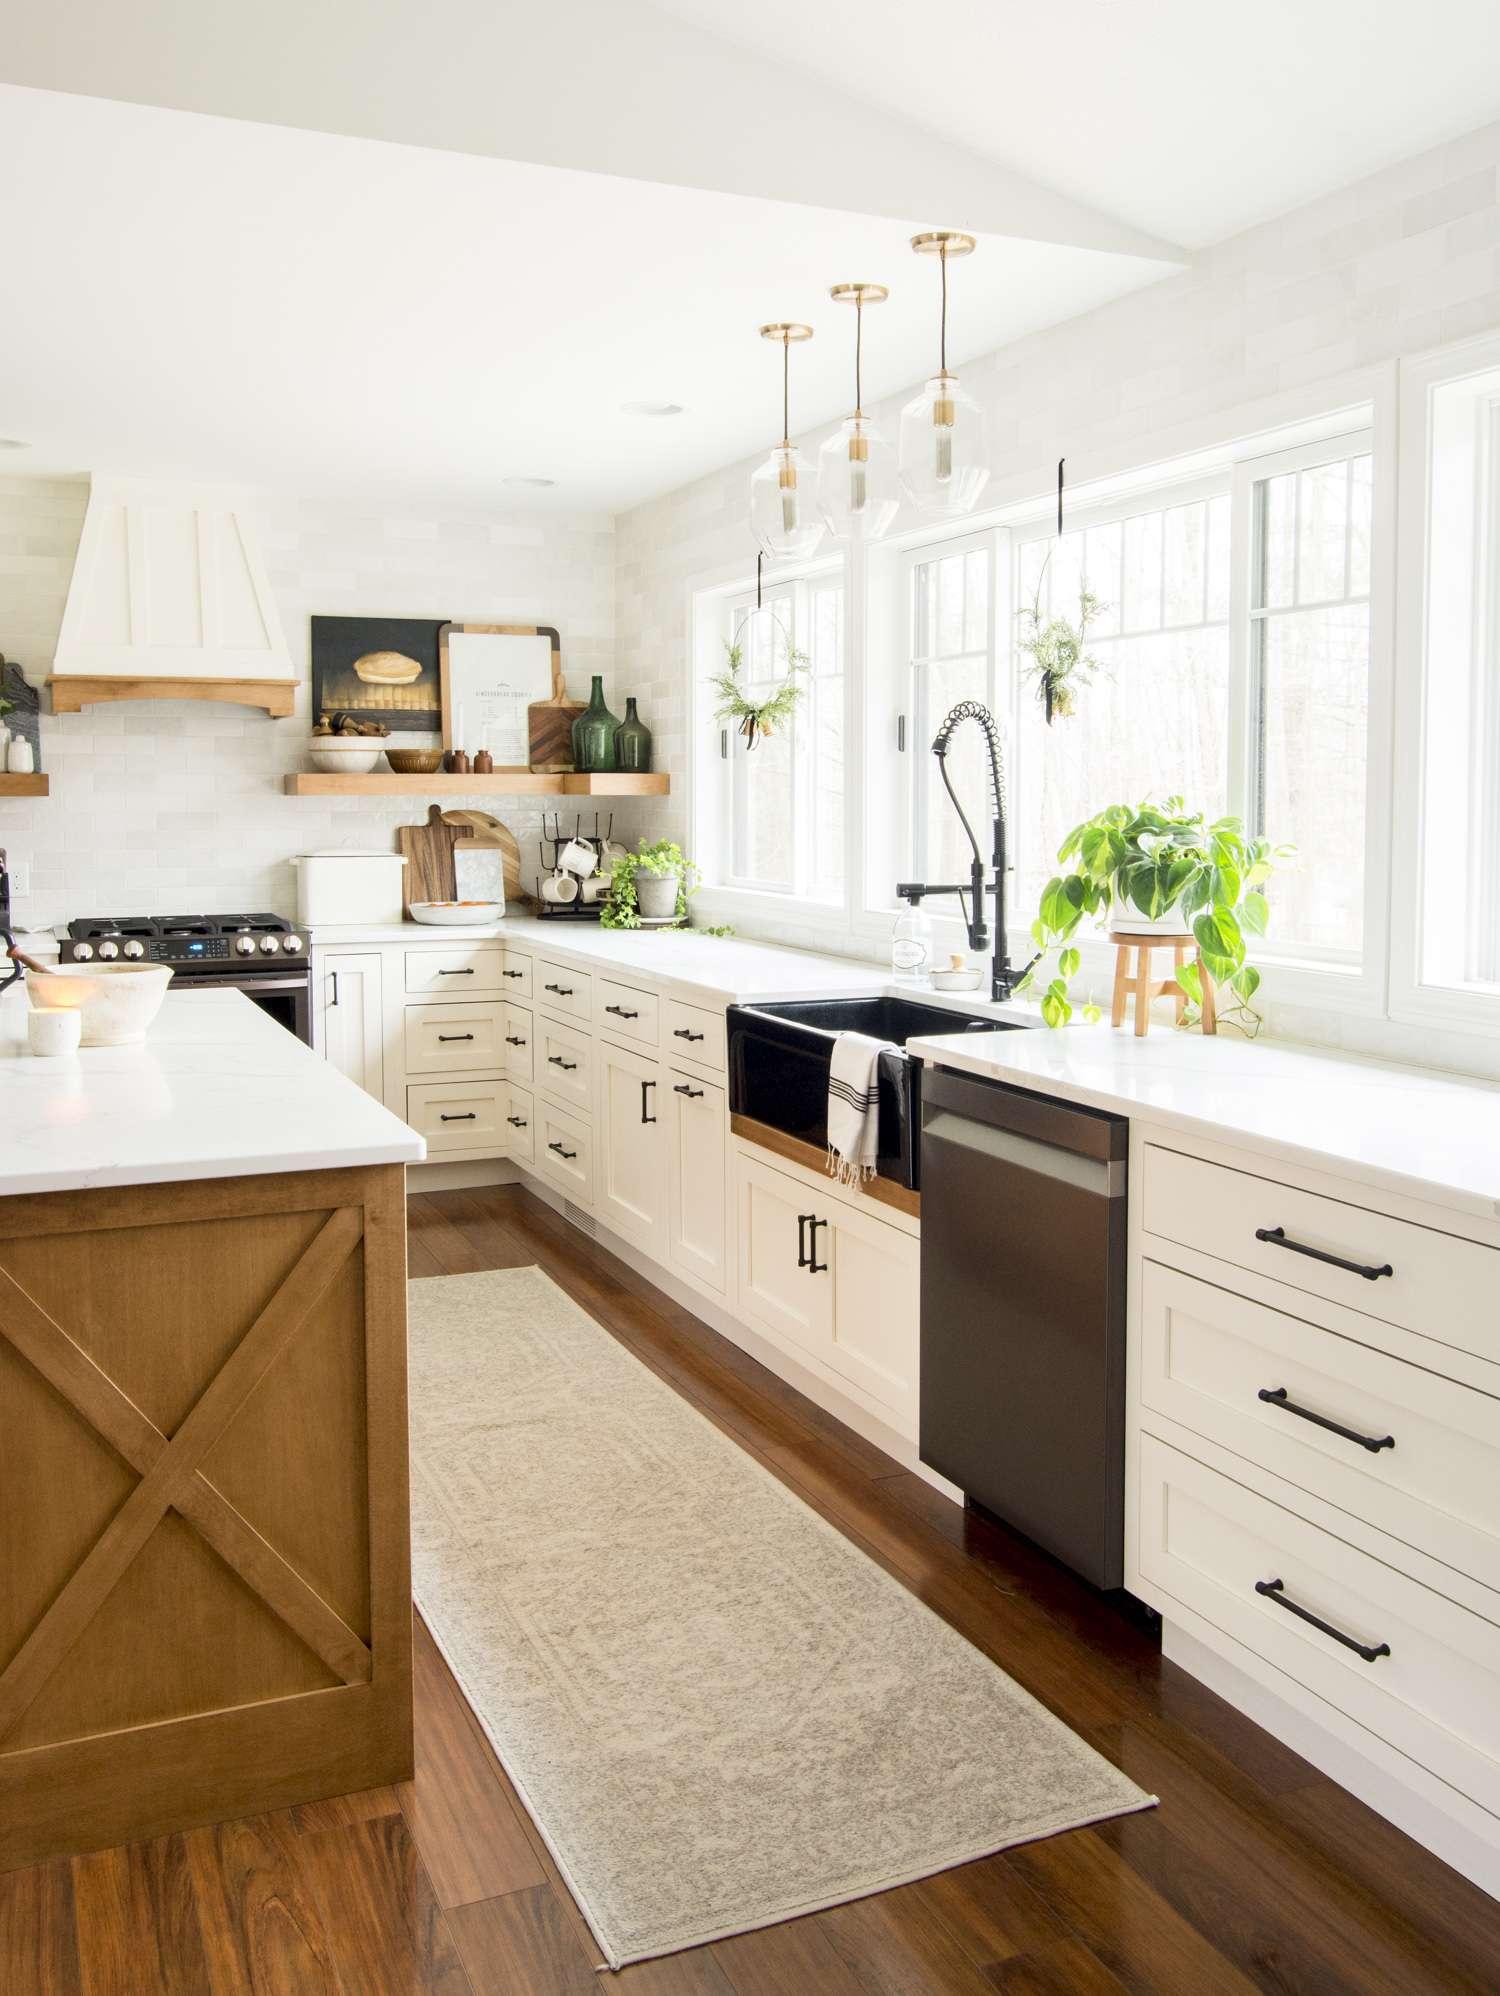 Modern farmhouse kitchen cabinet color.